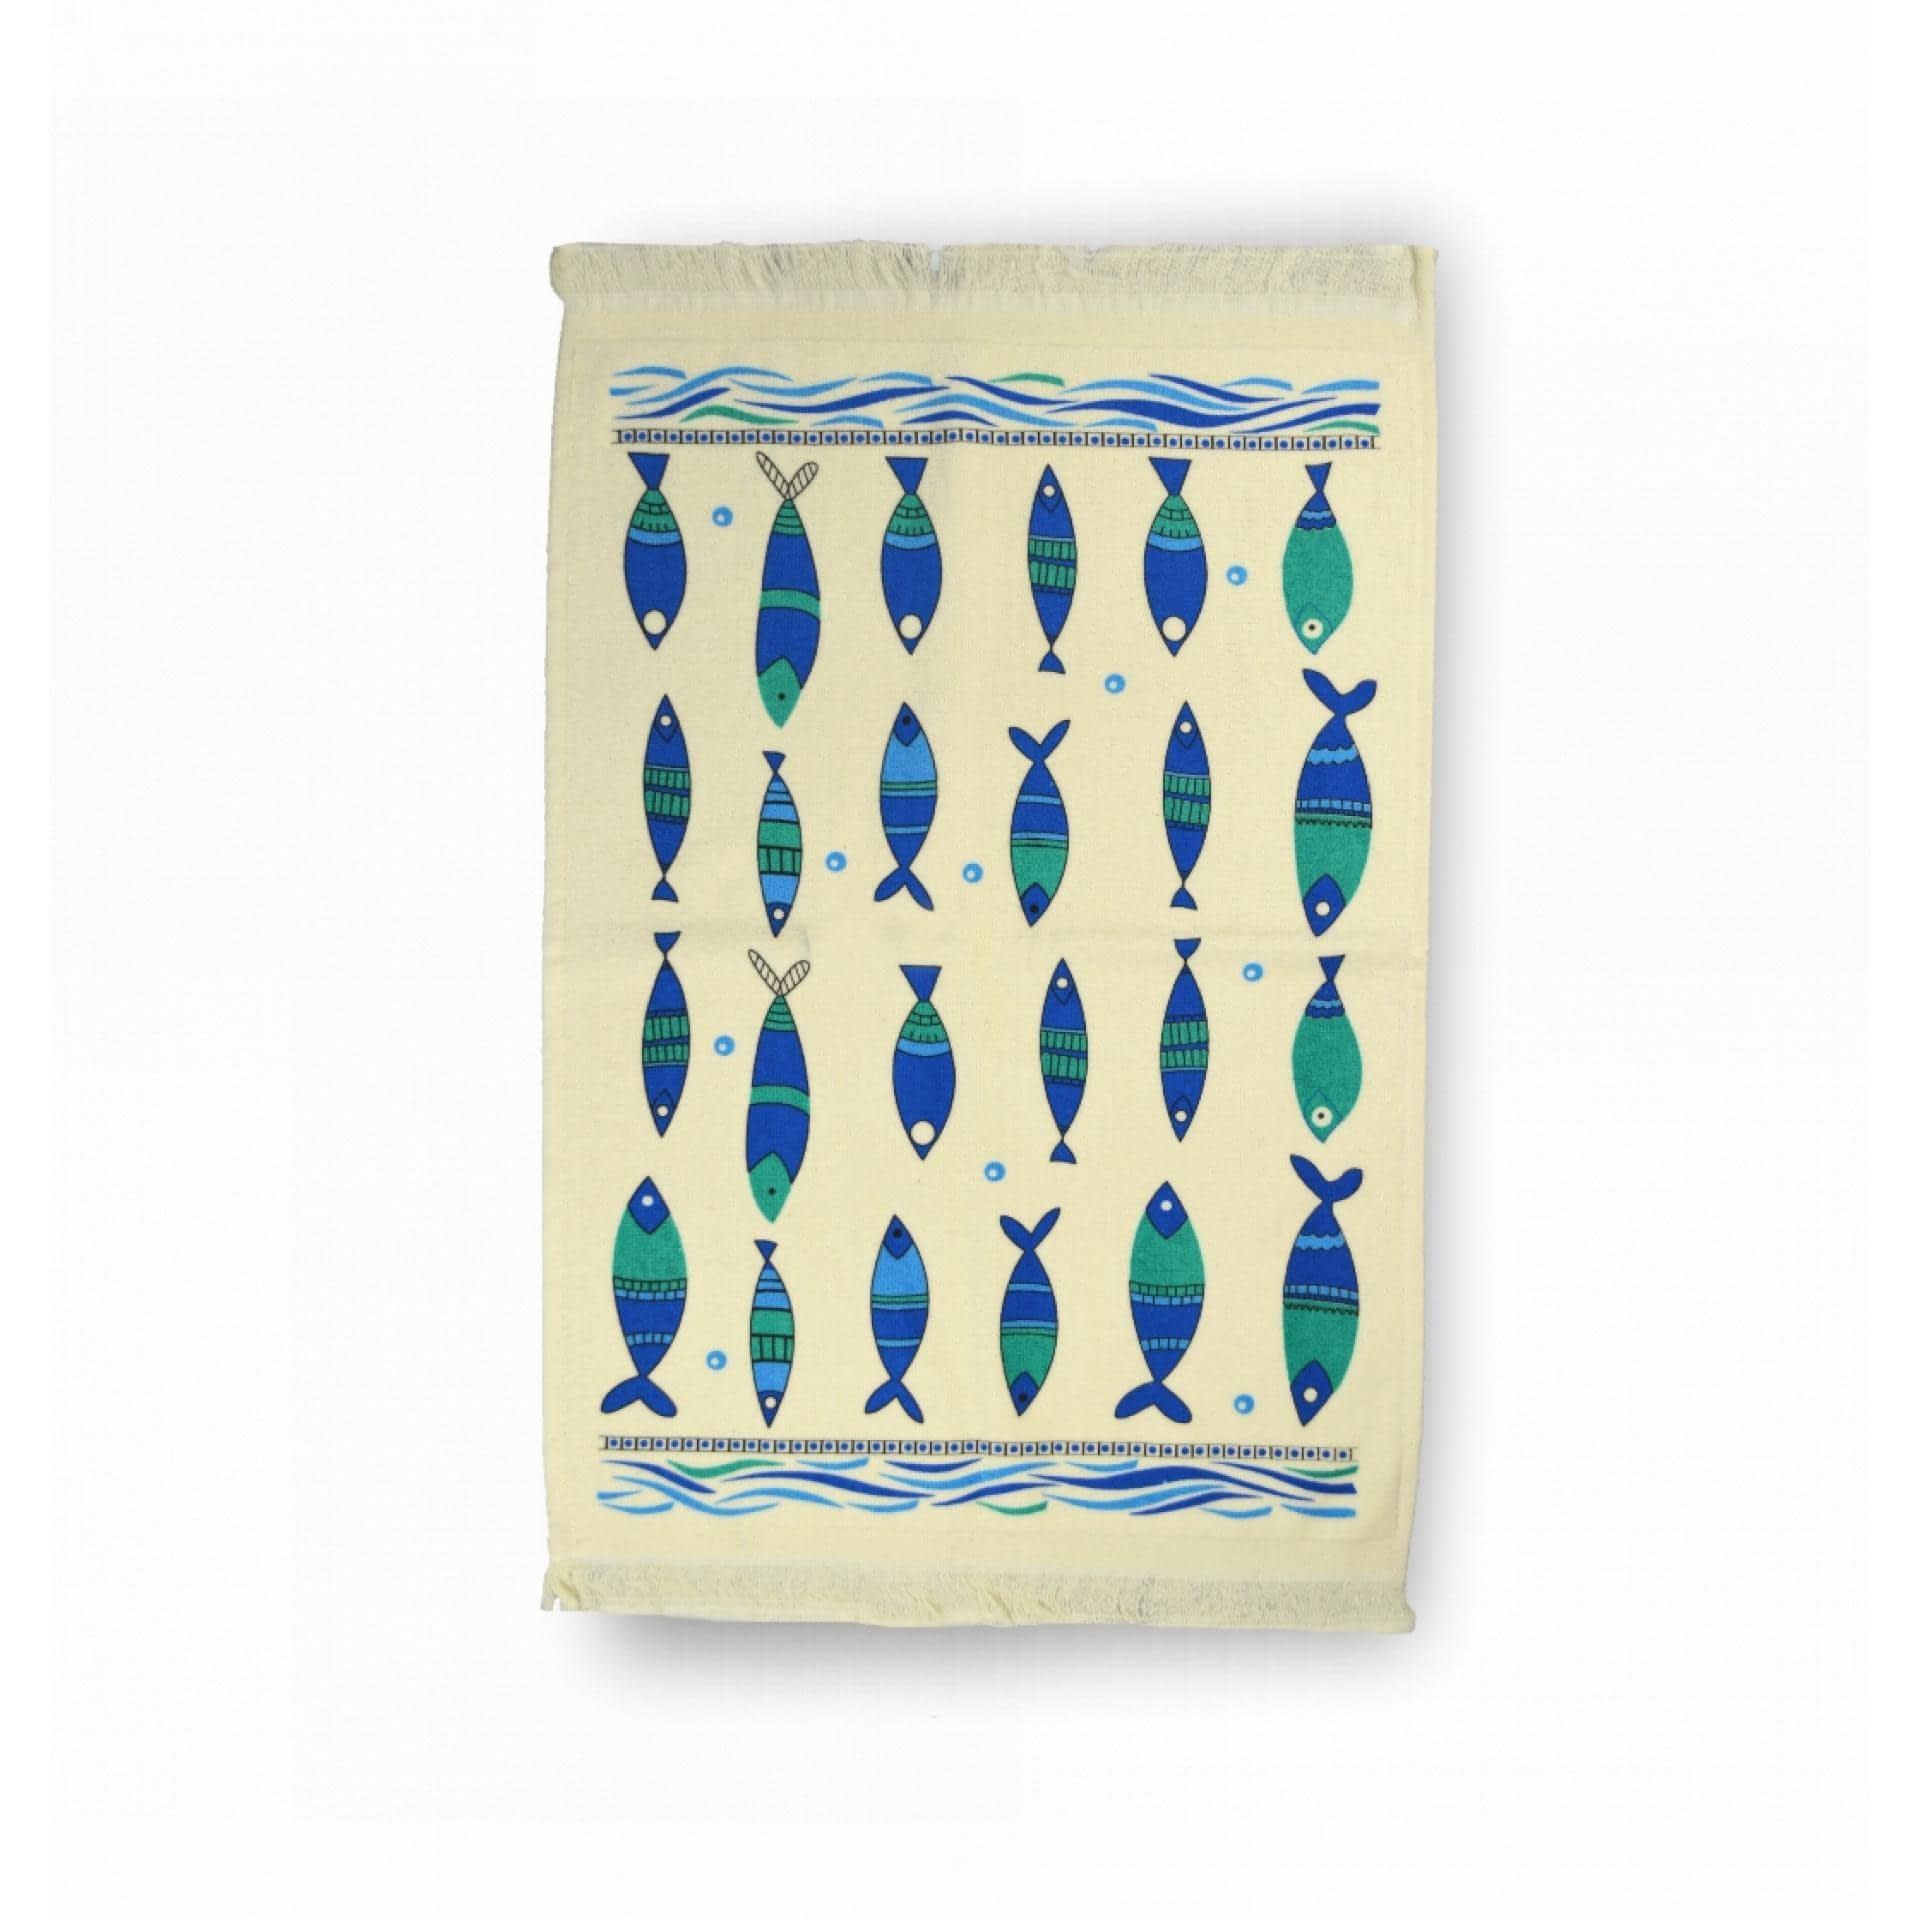 Ткани кухонные полотенца - ПОЛОТЕНЦЕ КУХОННОЕ ВЕЛЮРОВОЕ  40х60 РЫБКИ